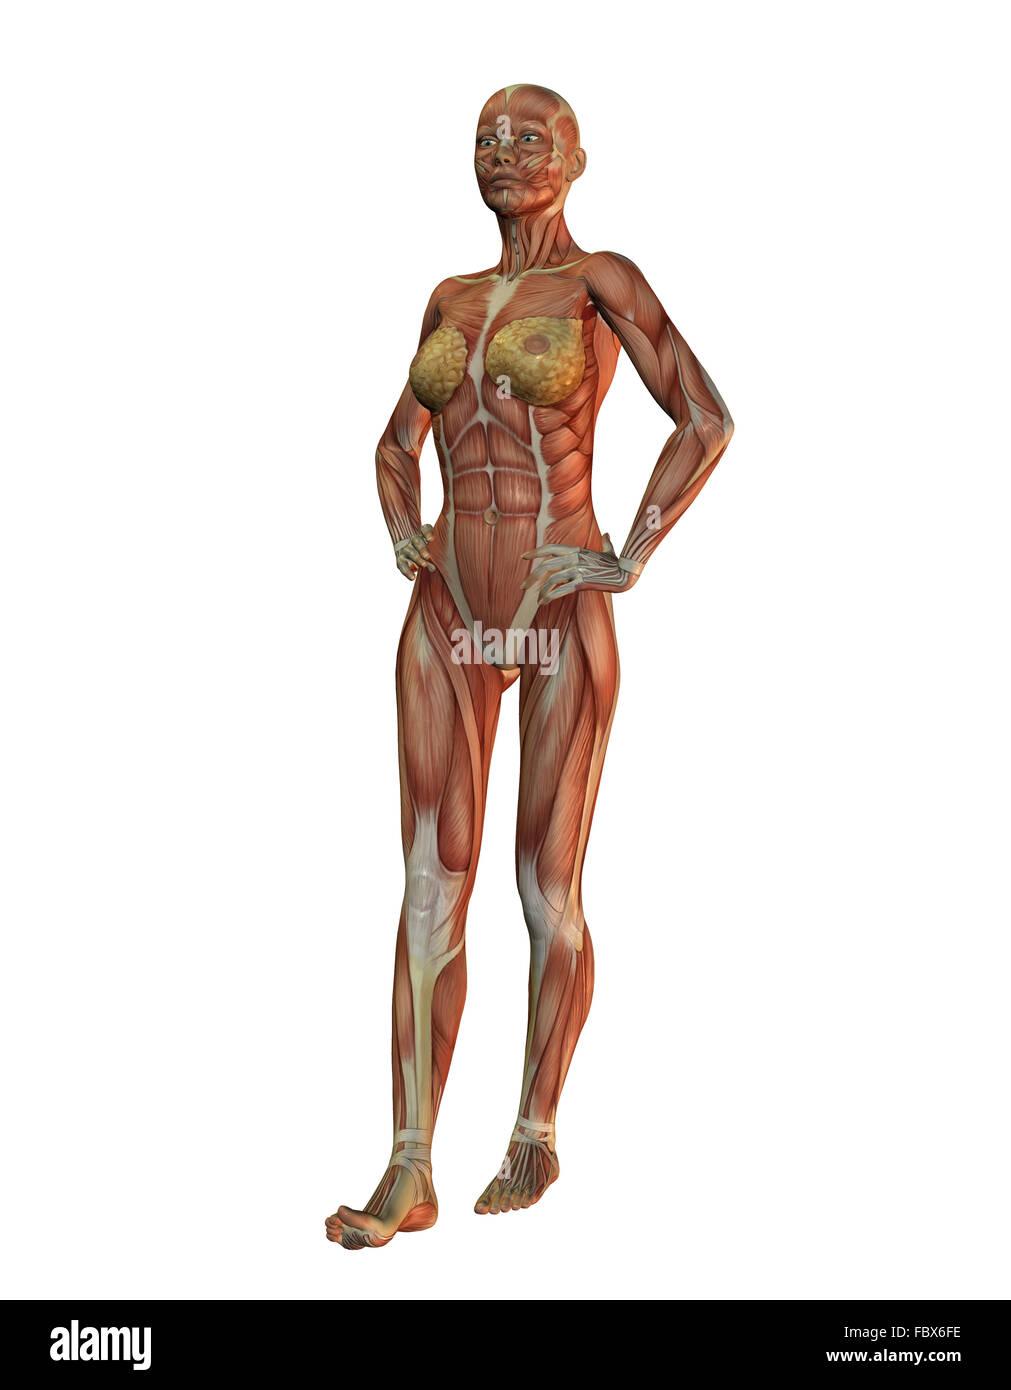 Female Chest Anatomy Stock Photos & Female Chest Anatomy Stock ...